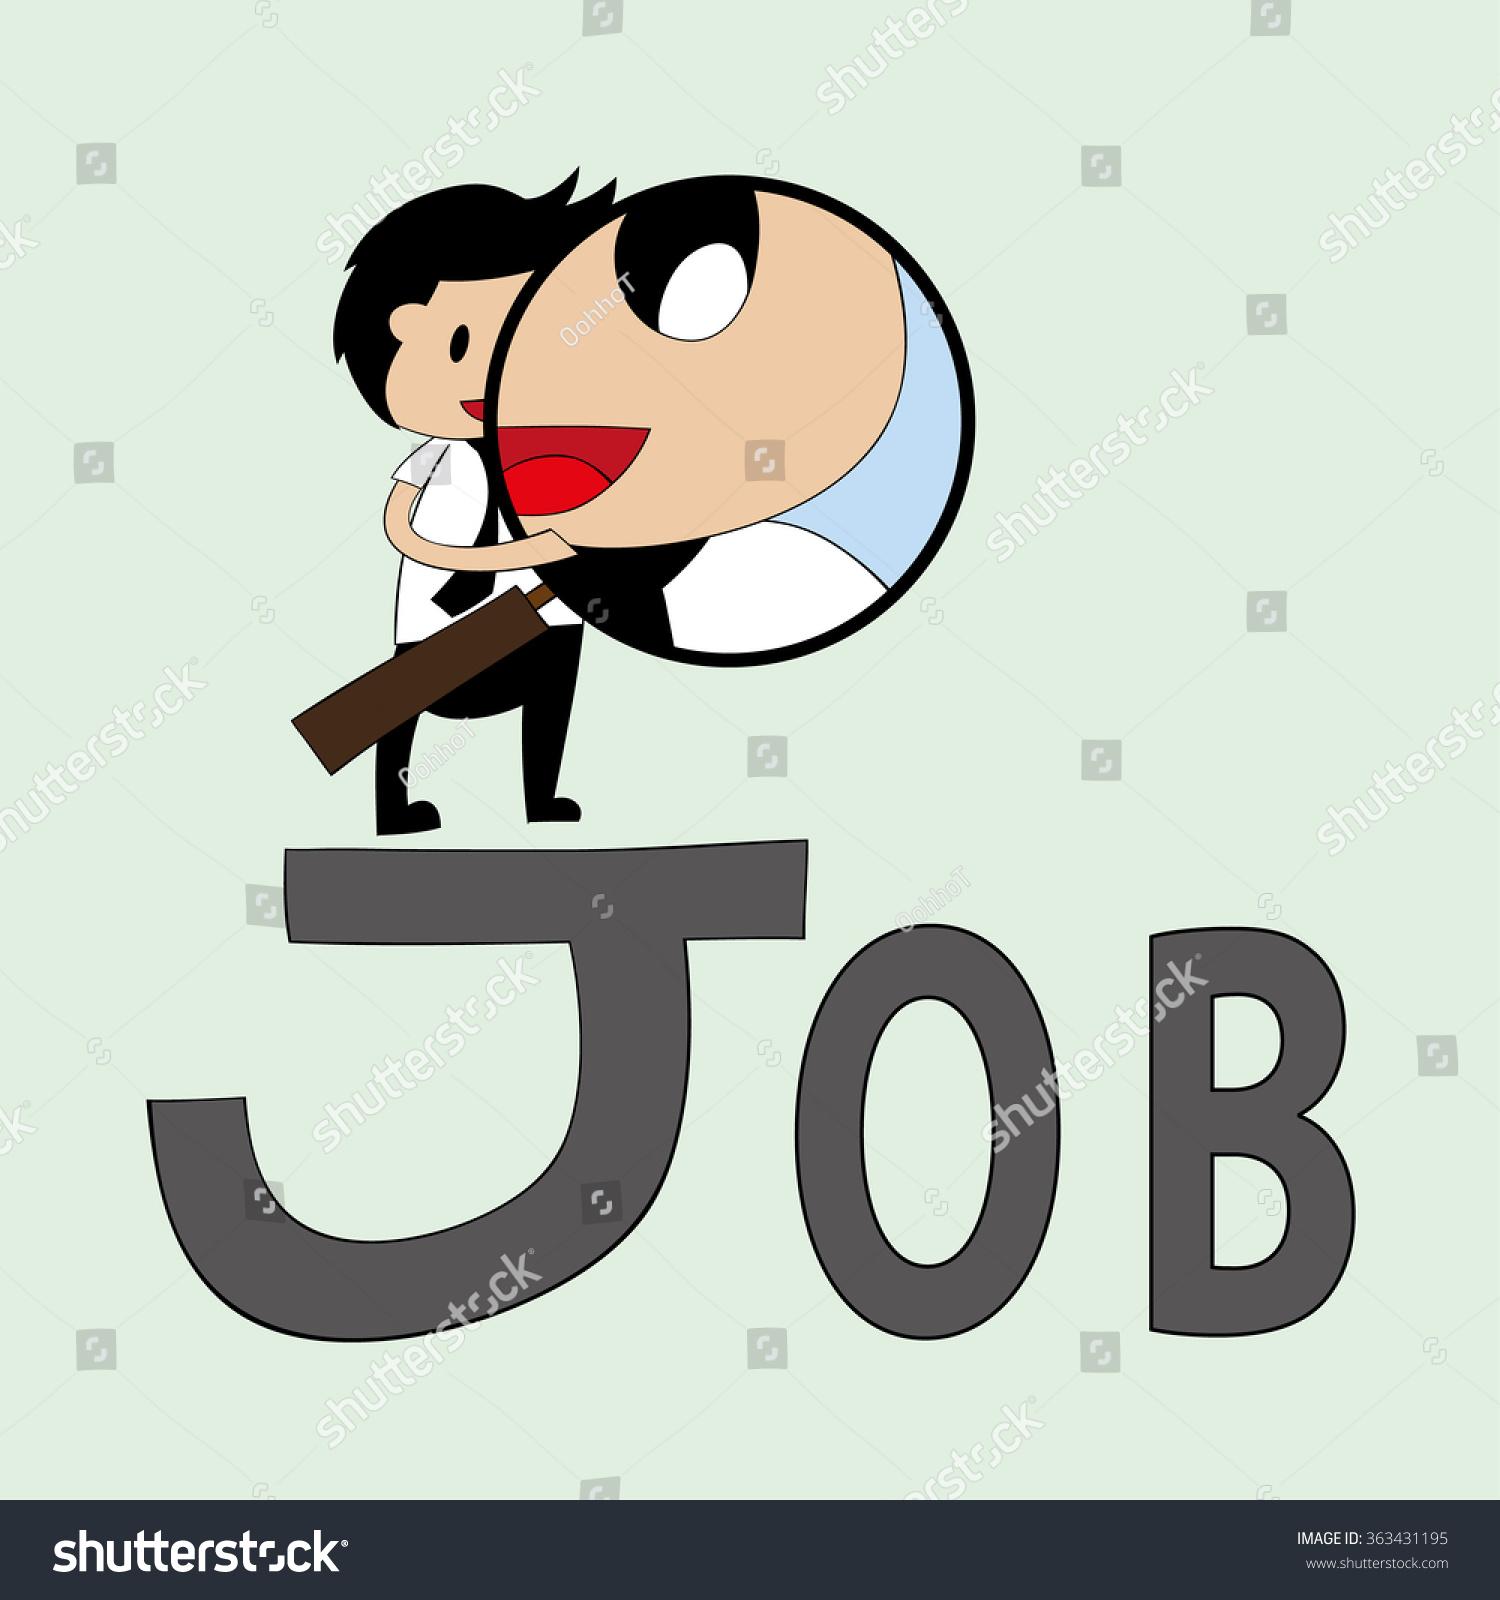 cartoon business man new job stock vector  cartoon business man new job zoom lens